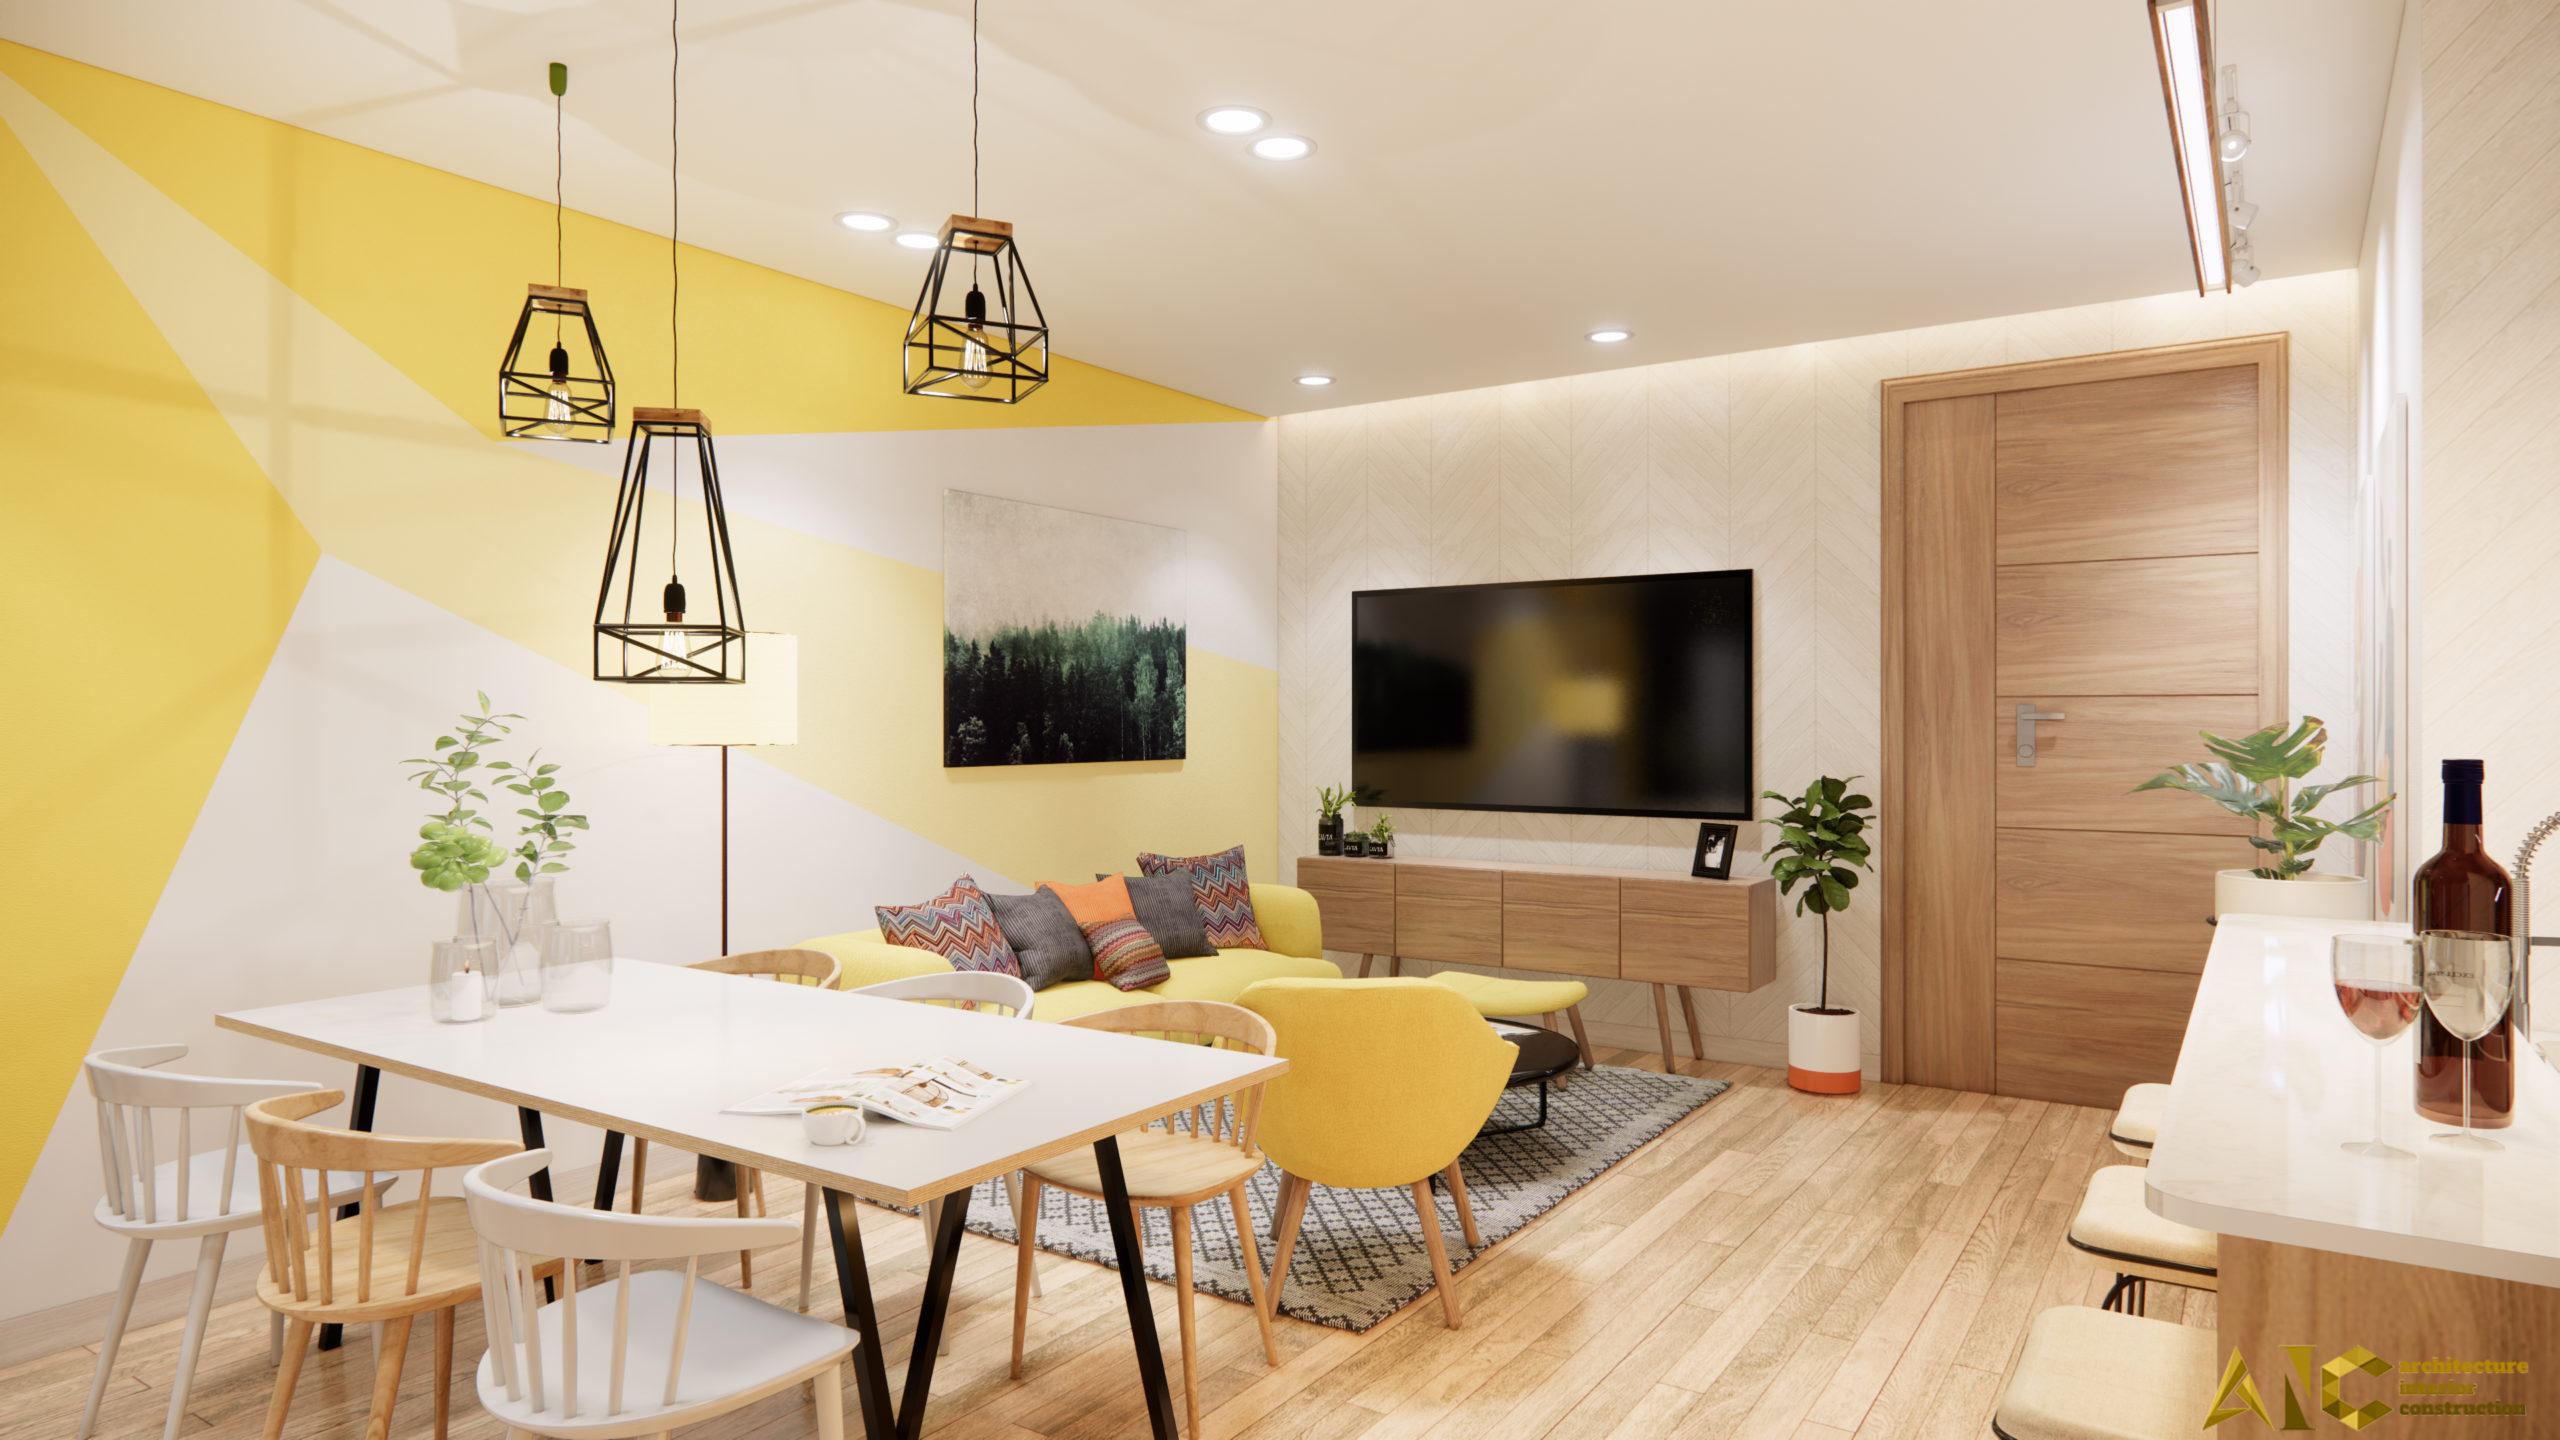 thiết kế căn hộ him lam (11)